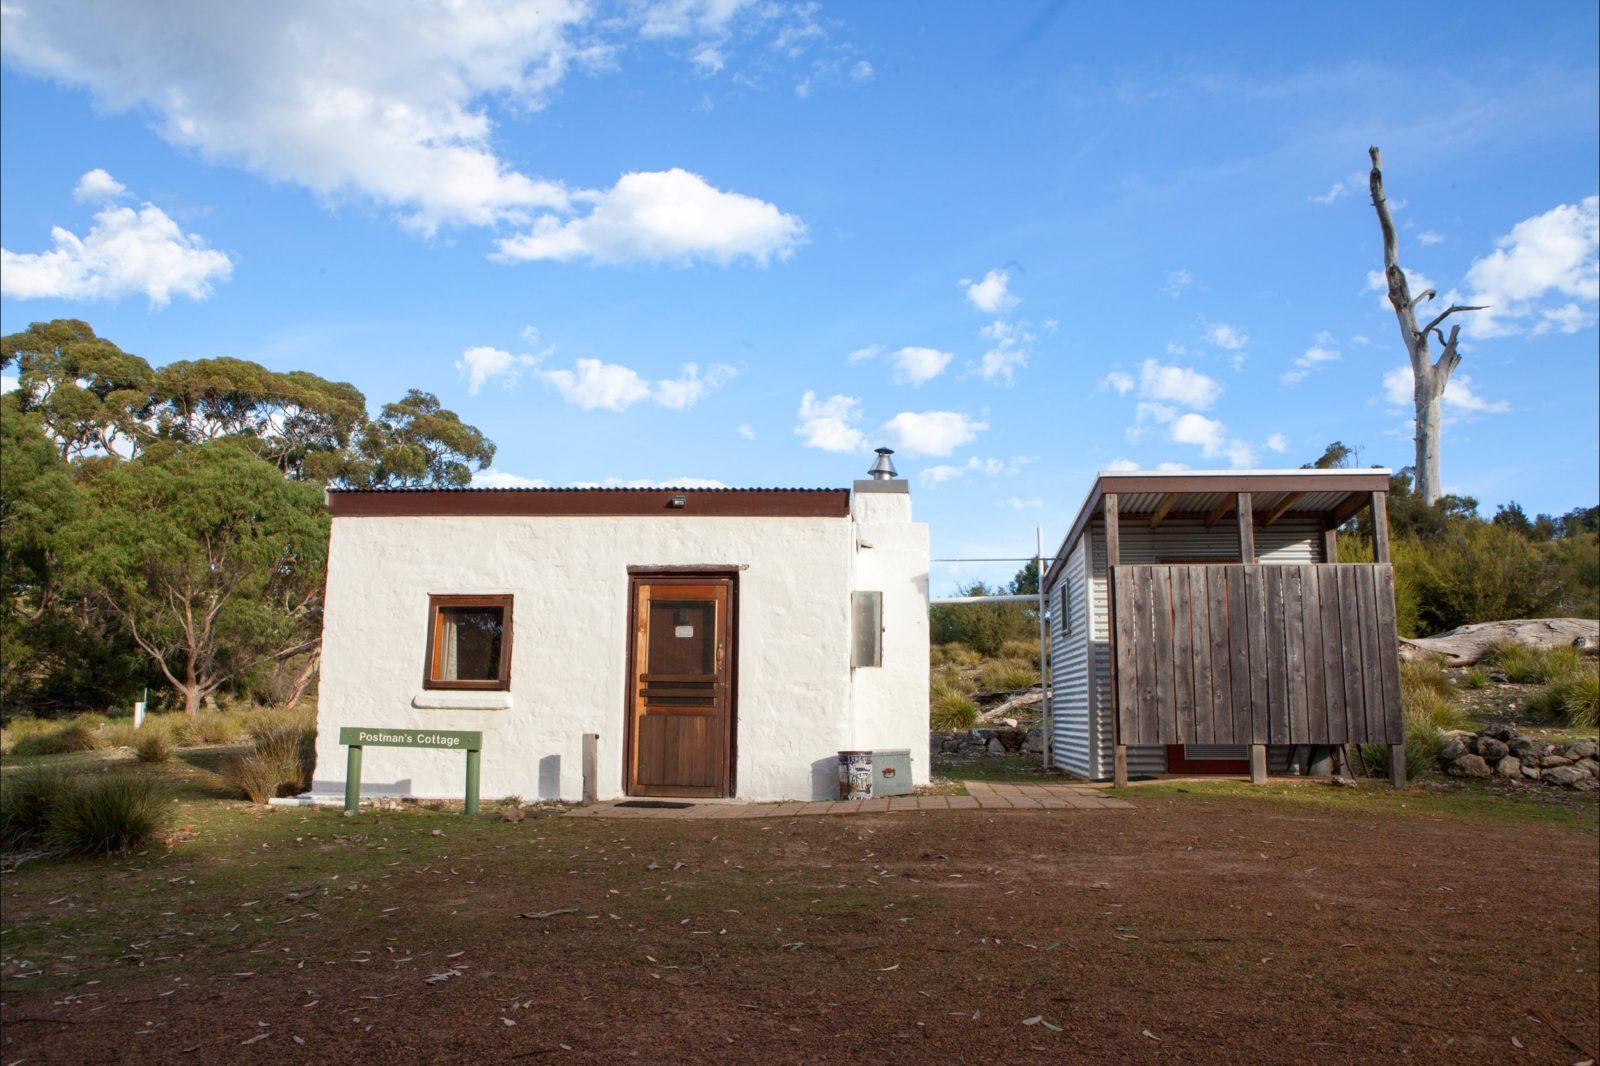 Postman's Cottage - Flinders Chase